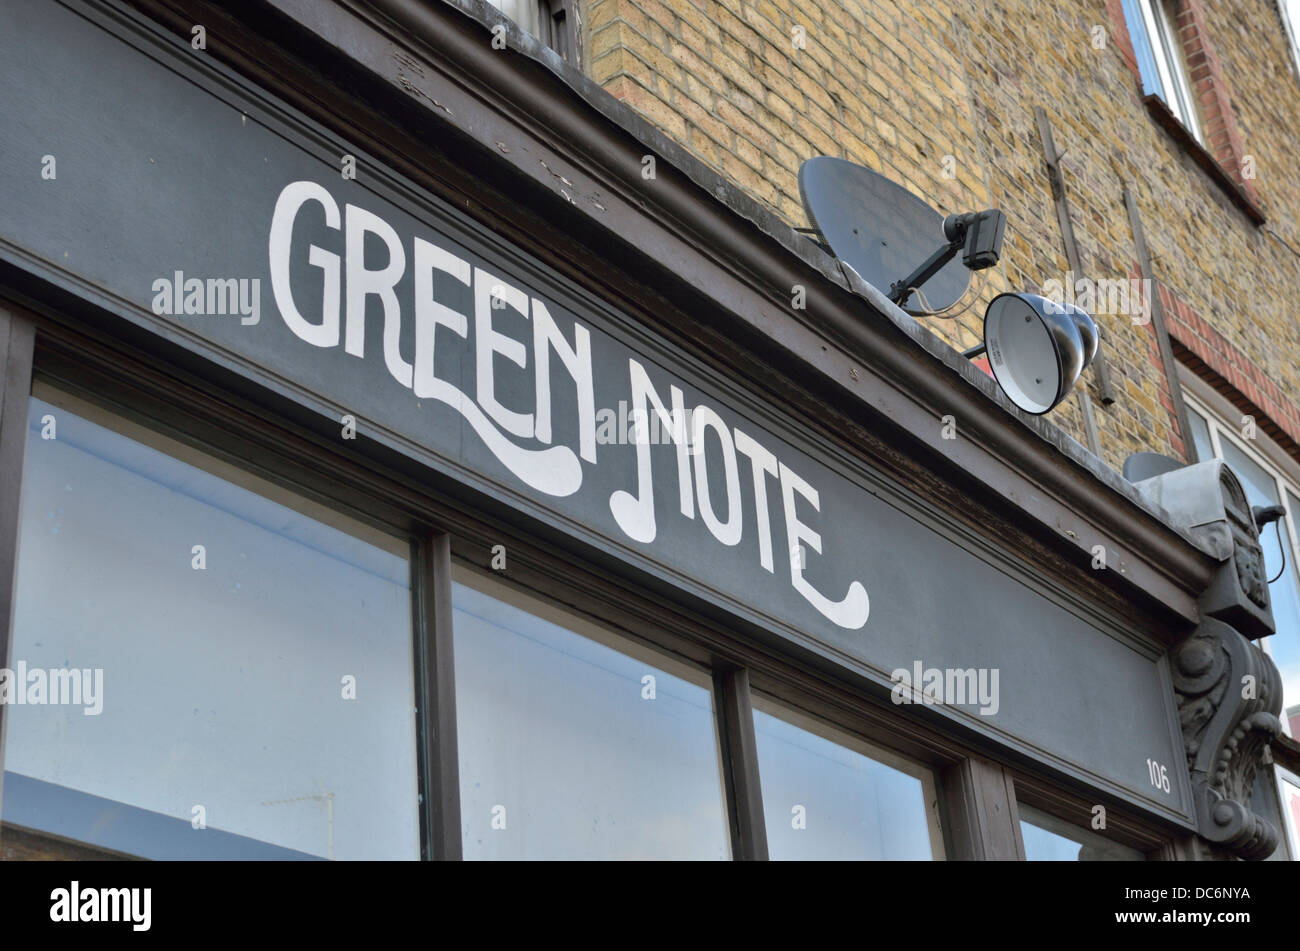 Die grüne Note live-Musik Veranstaltungsort in Camden Town, London, UK. Stockbild